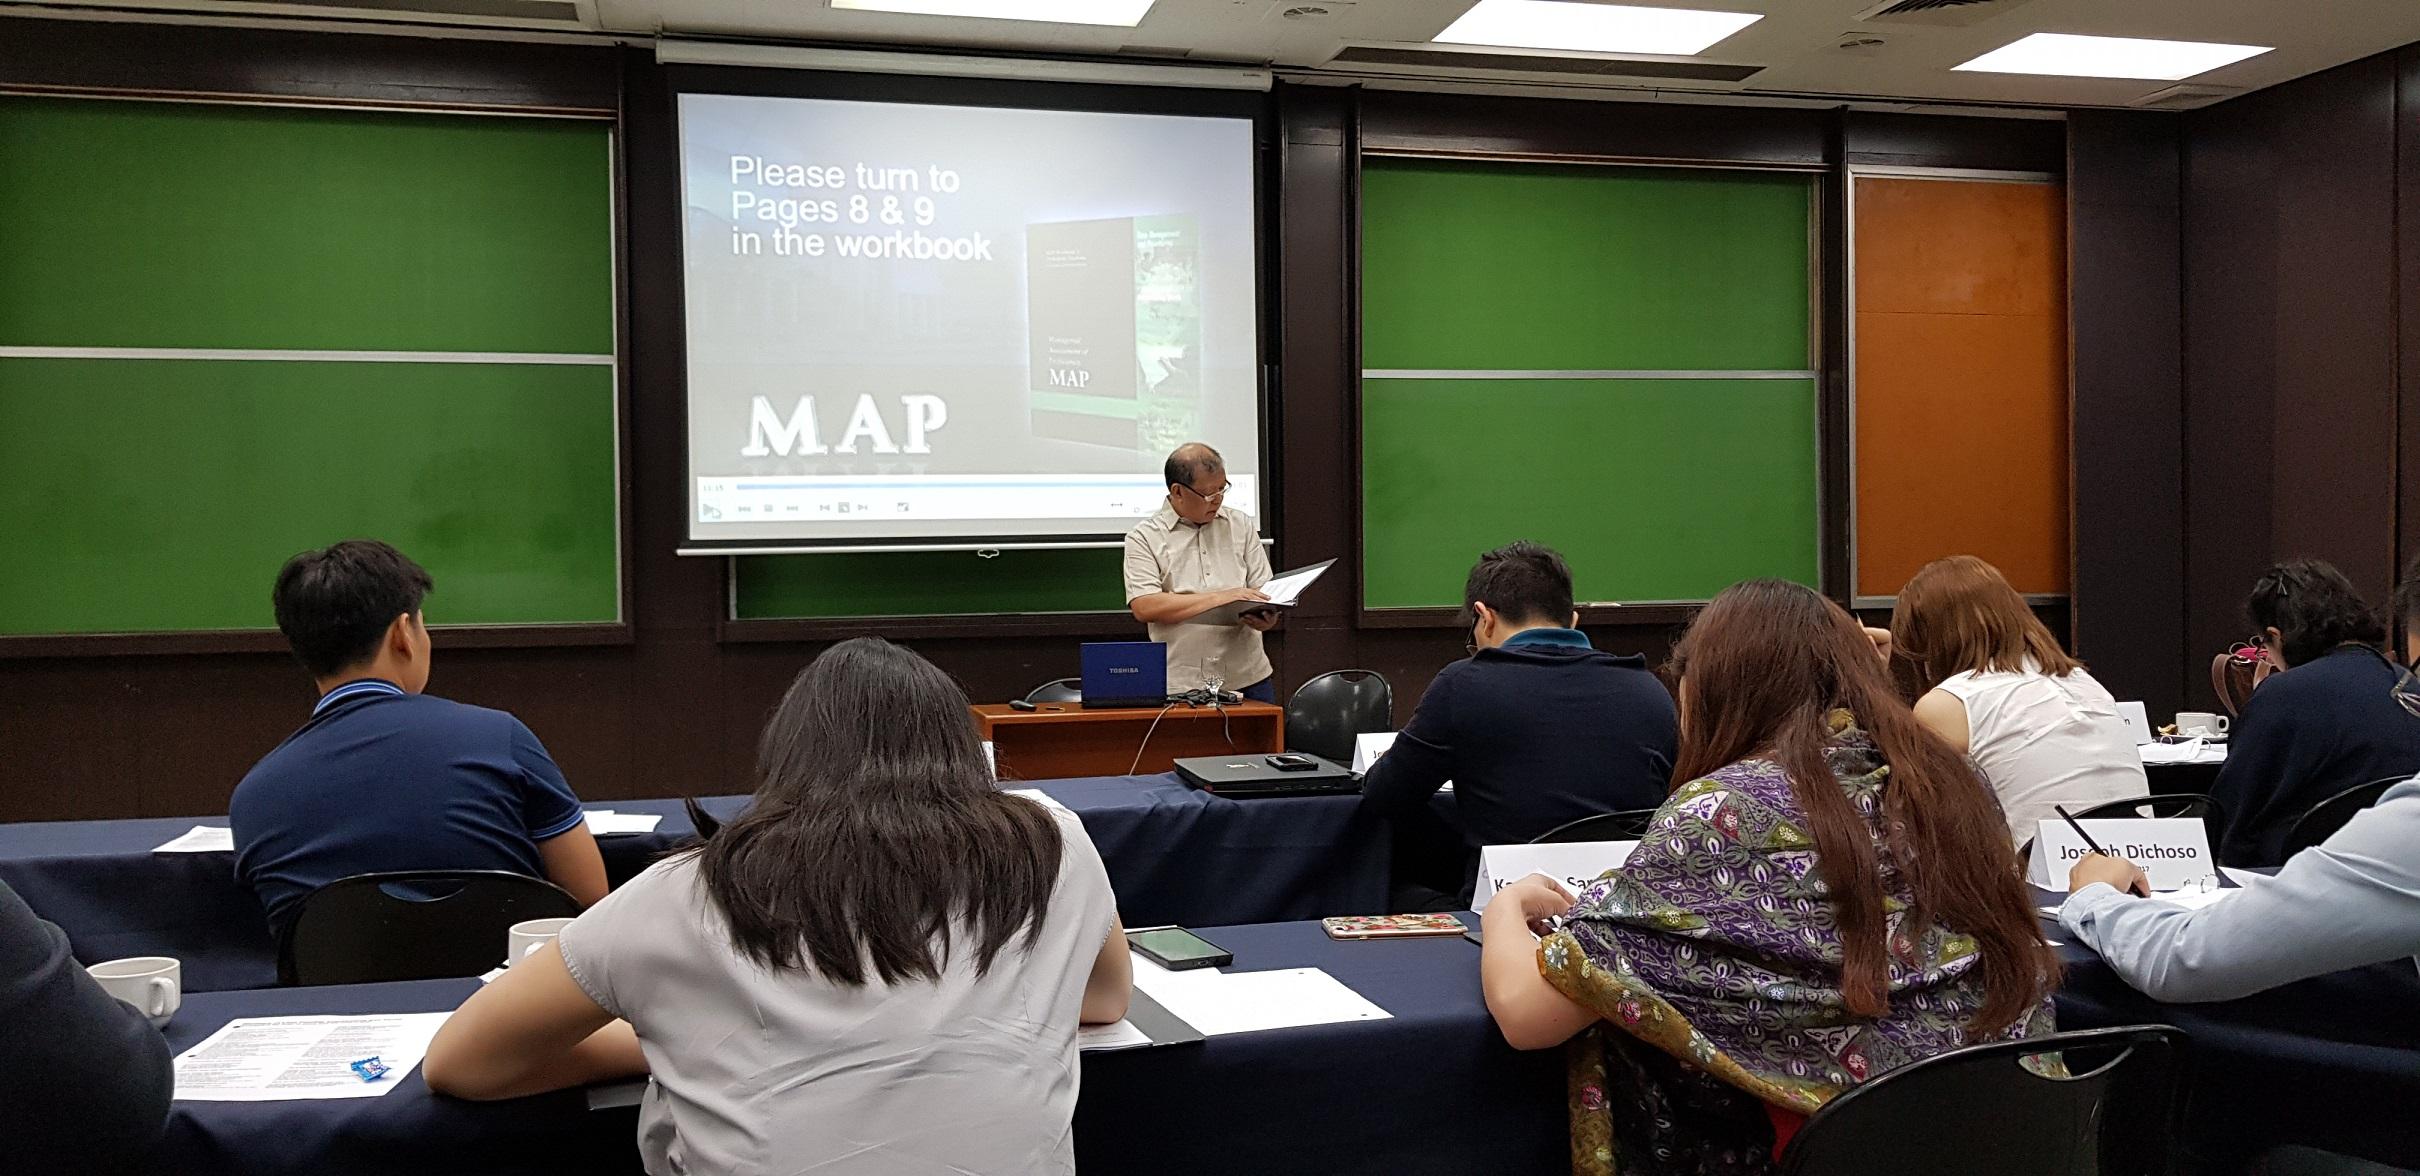 MDP alumnus Galo Ignacio speaks in front of recent AIM graduates during Day 1 of the MAP session.